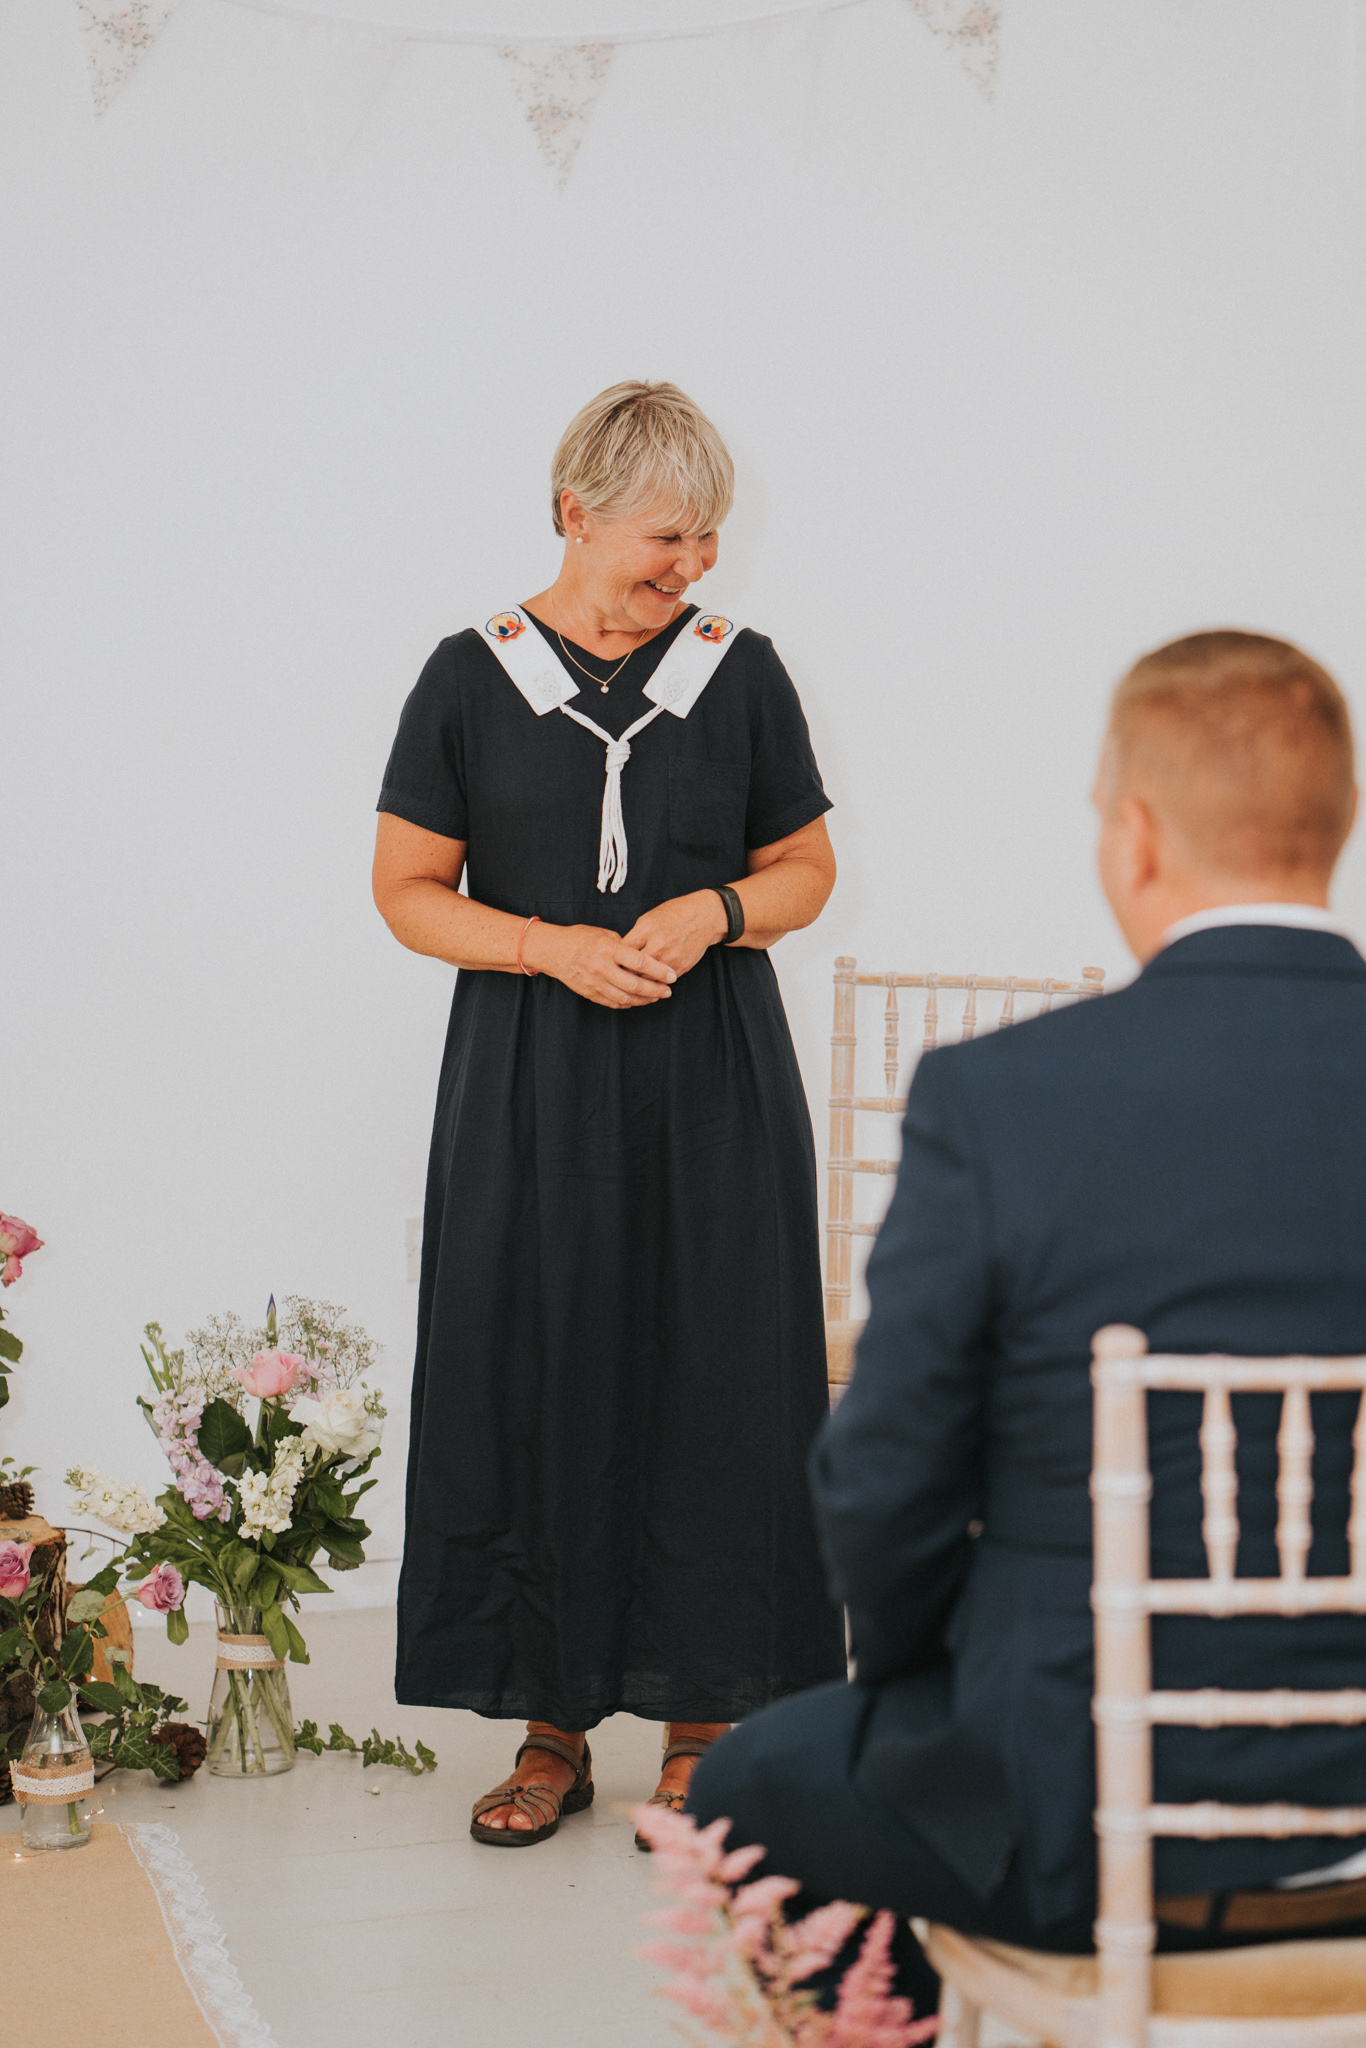 Grace-Elizabeth-Georgie-Amalaketu-Firstsite-Colchester-Essex-Boho-Buddhist-Wedding-Alternative-Wedding-Photography-Essex (44 of 100).jpg